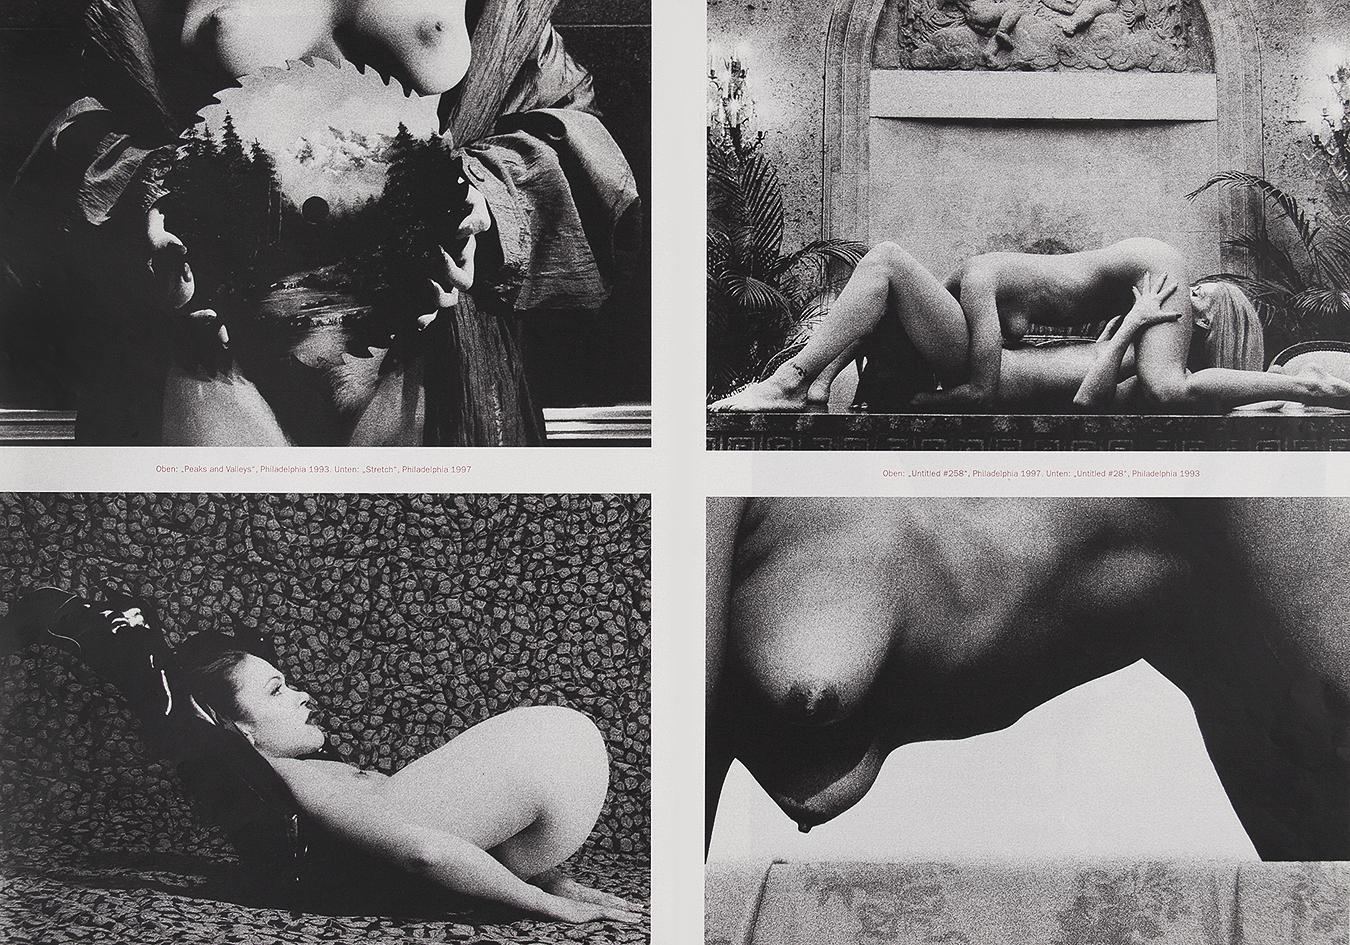 Tony_Ward_photography_fashion_erotic_editorials_Max_magazine_Hamburg_Germany_andrea_suwa_lingerie_bare_breast_love_erotica